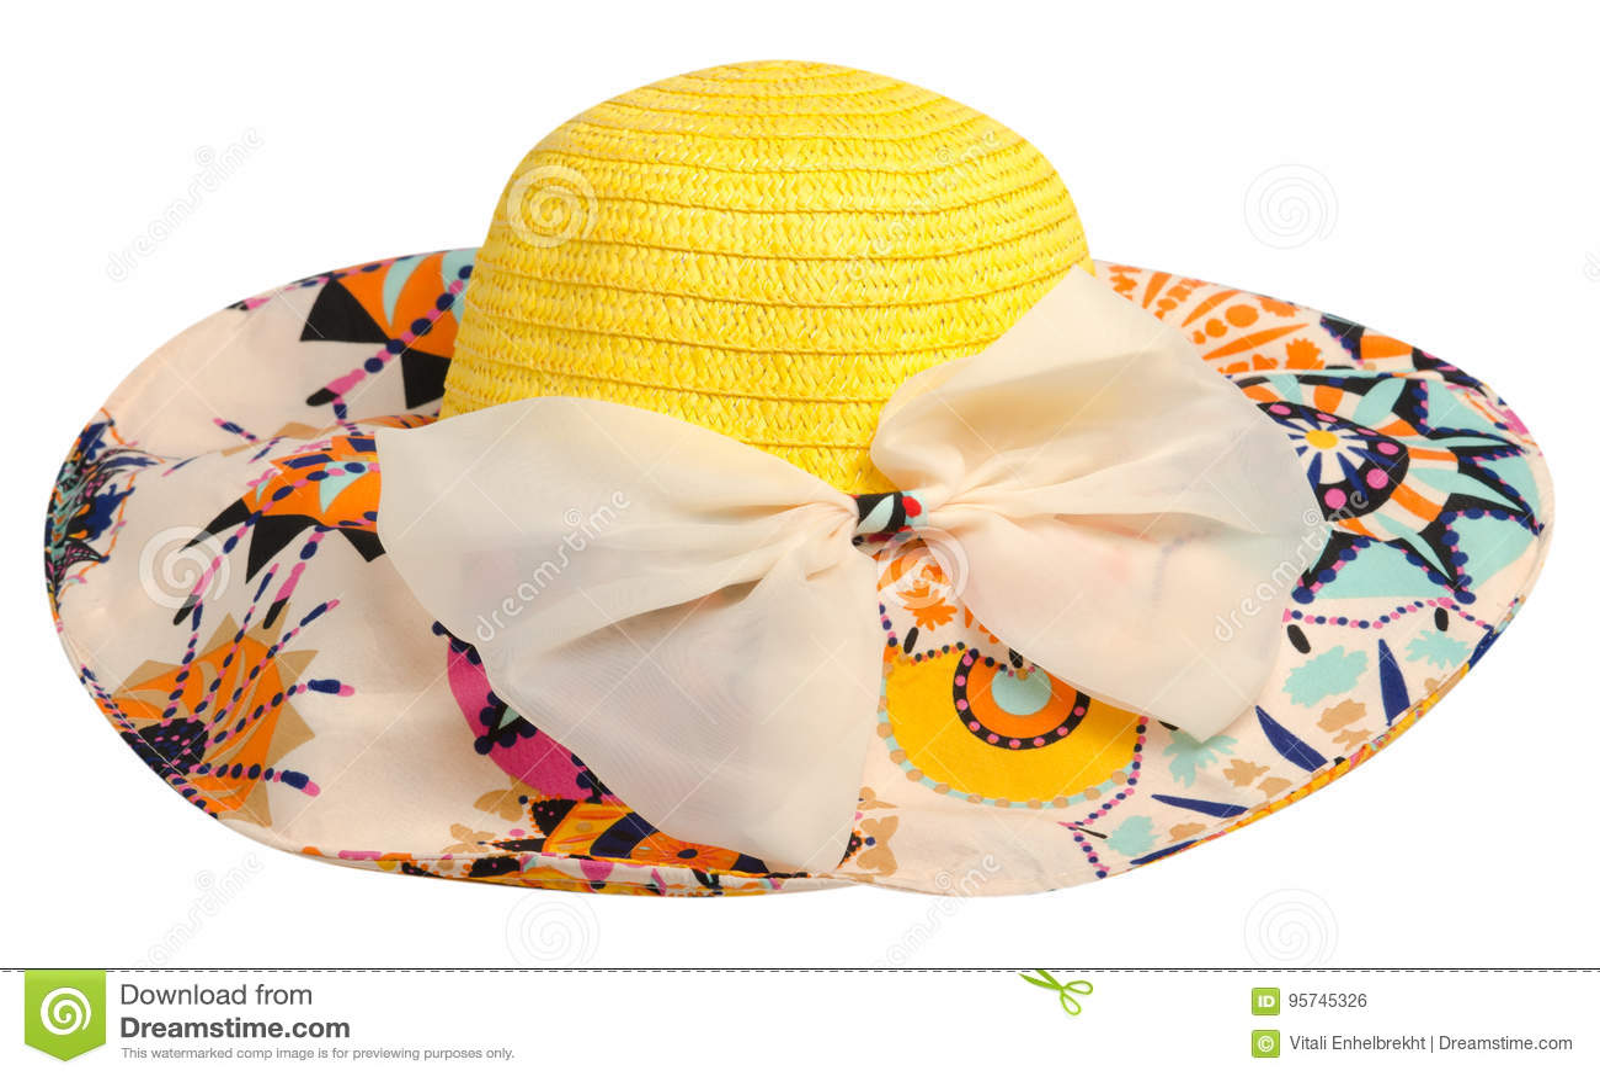 29c4611b6d Chapéu da mulher isolado no fundo branco Women& x27; chapéu da praia de s  Chapéu colorido